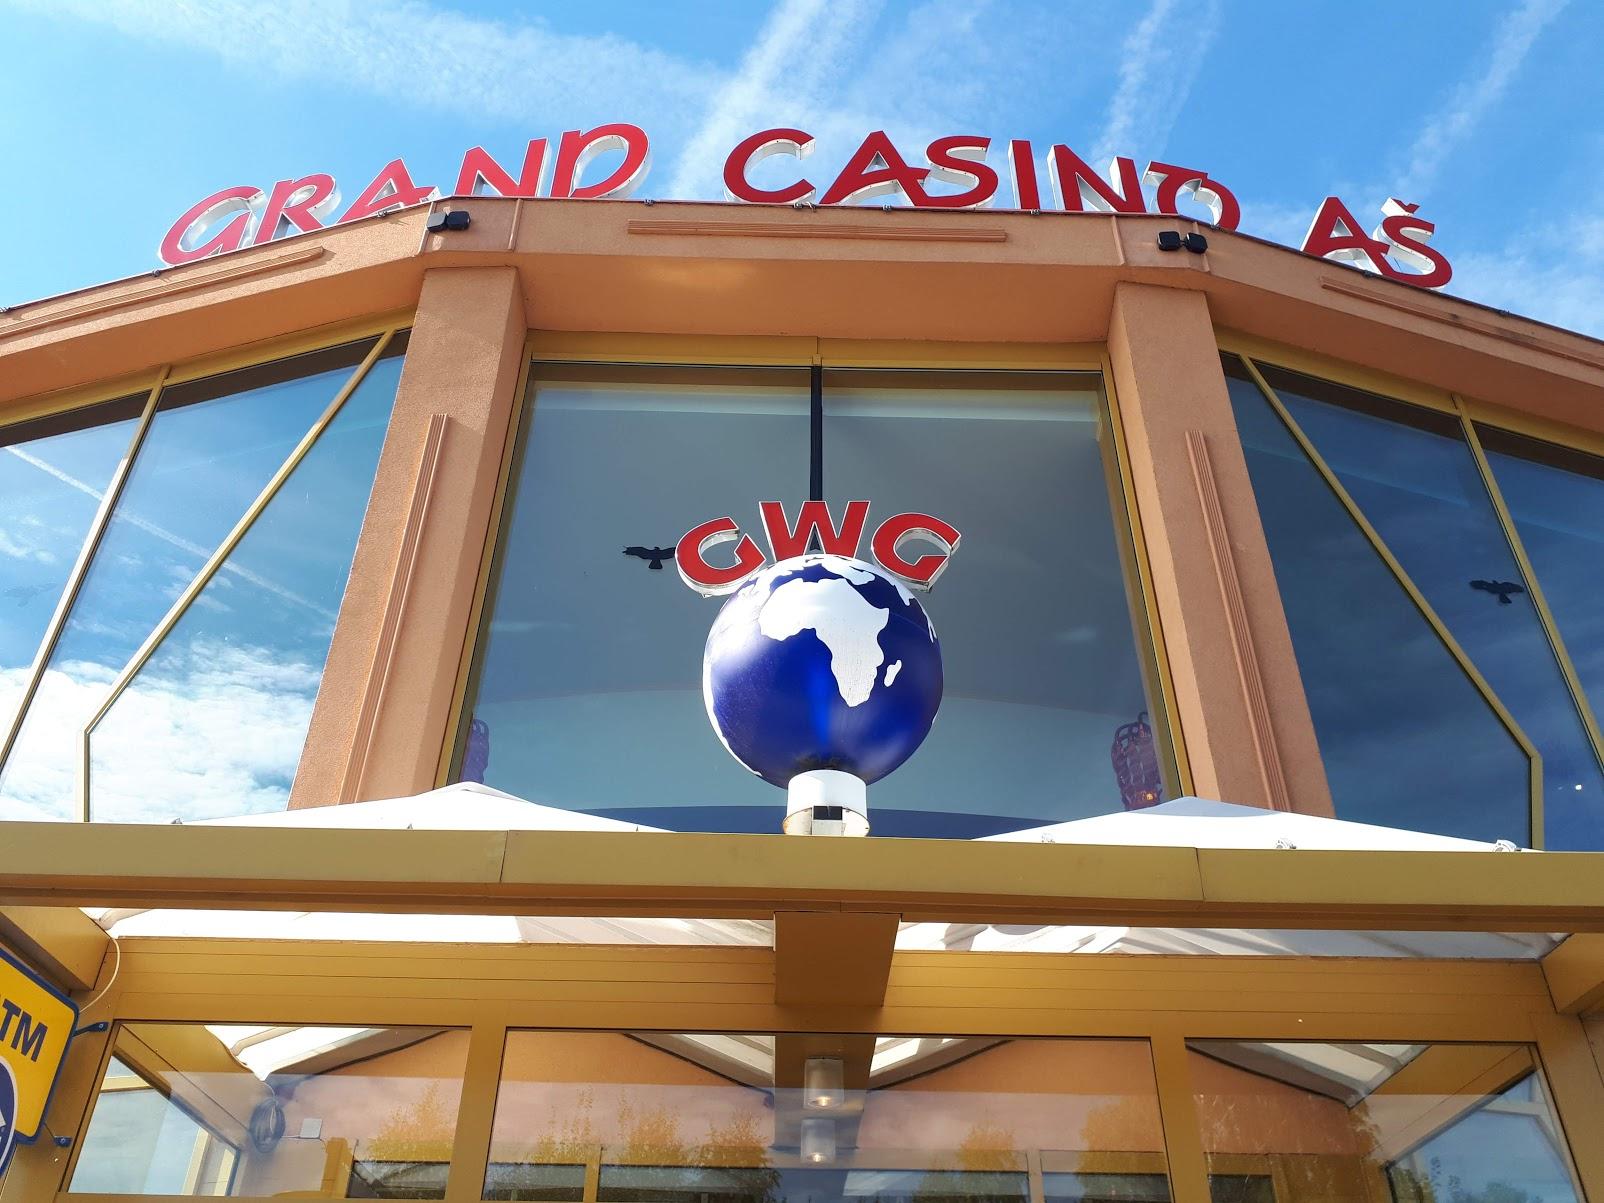 Grand Casino Aš